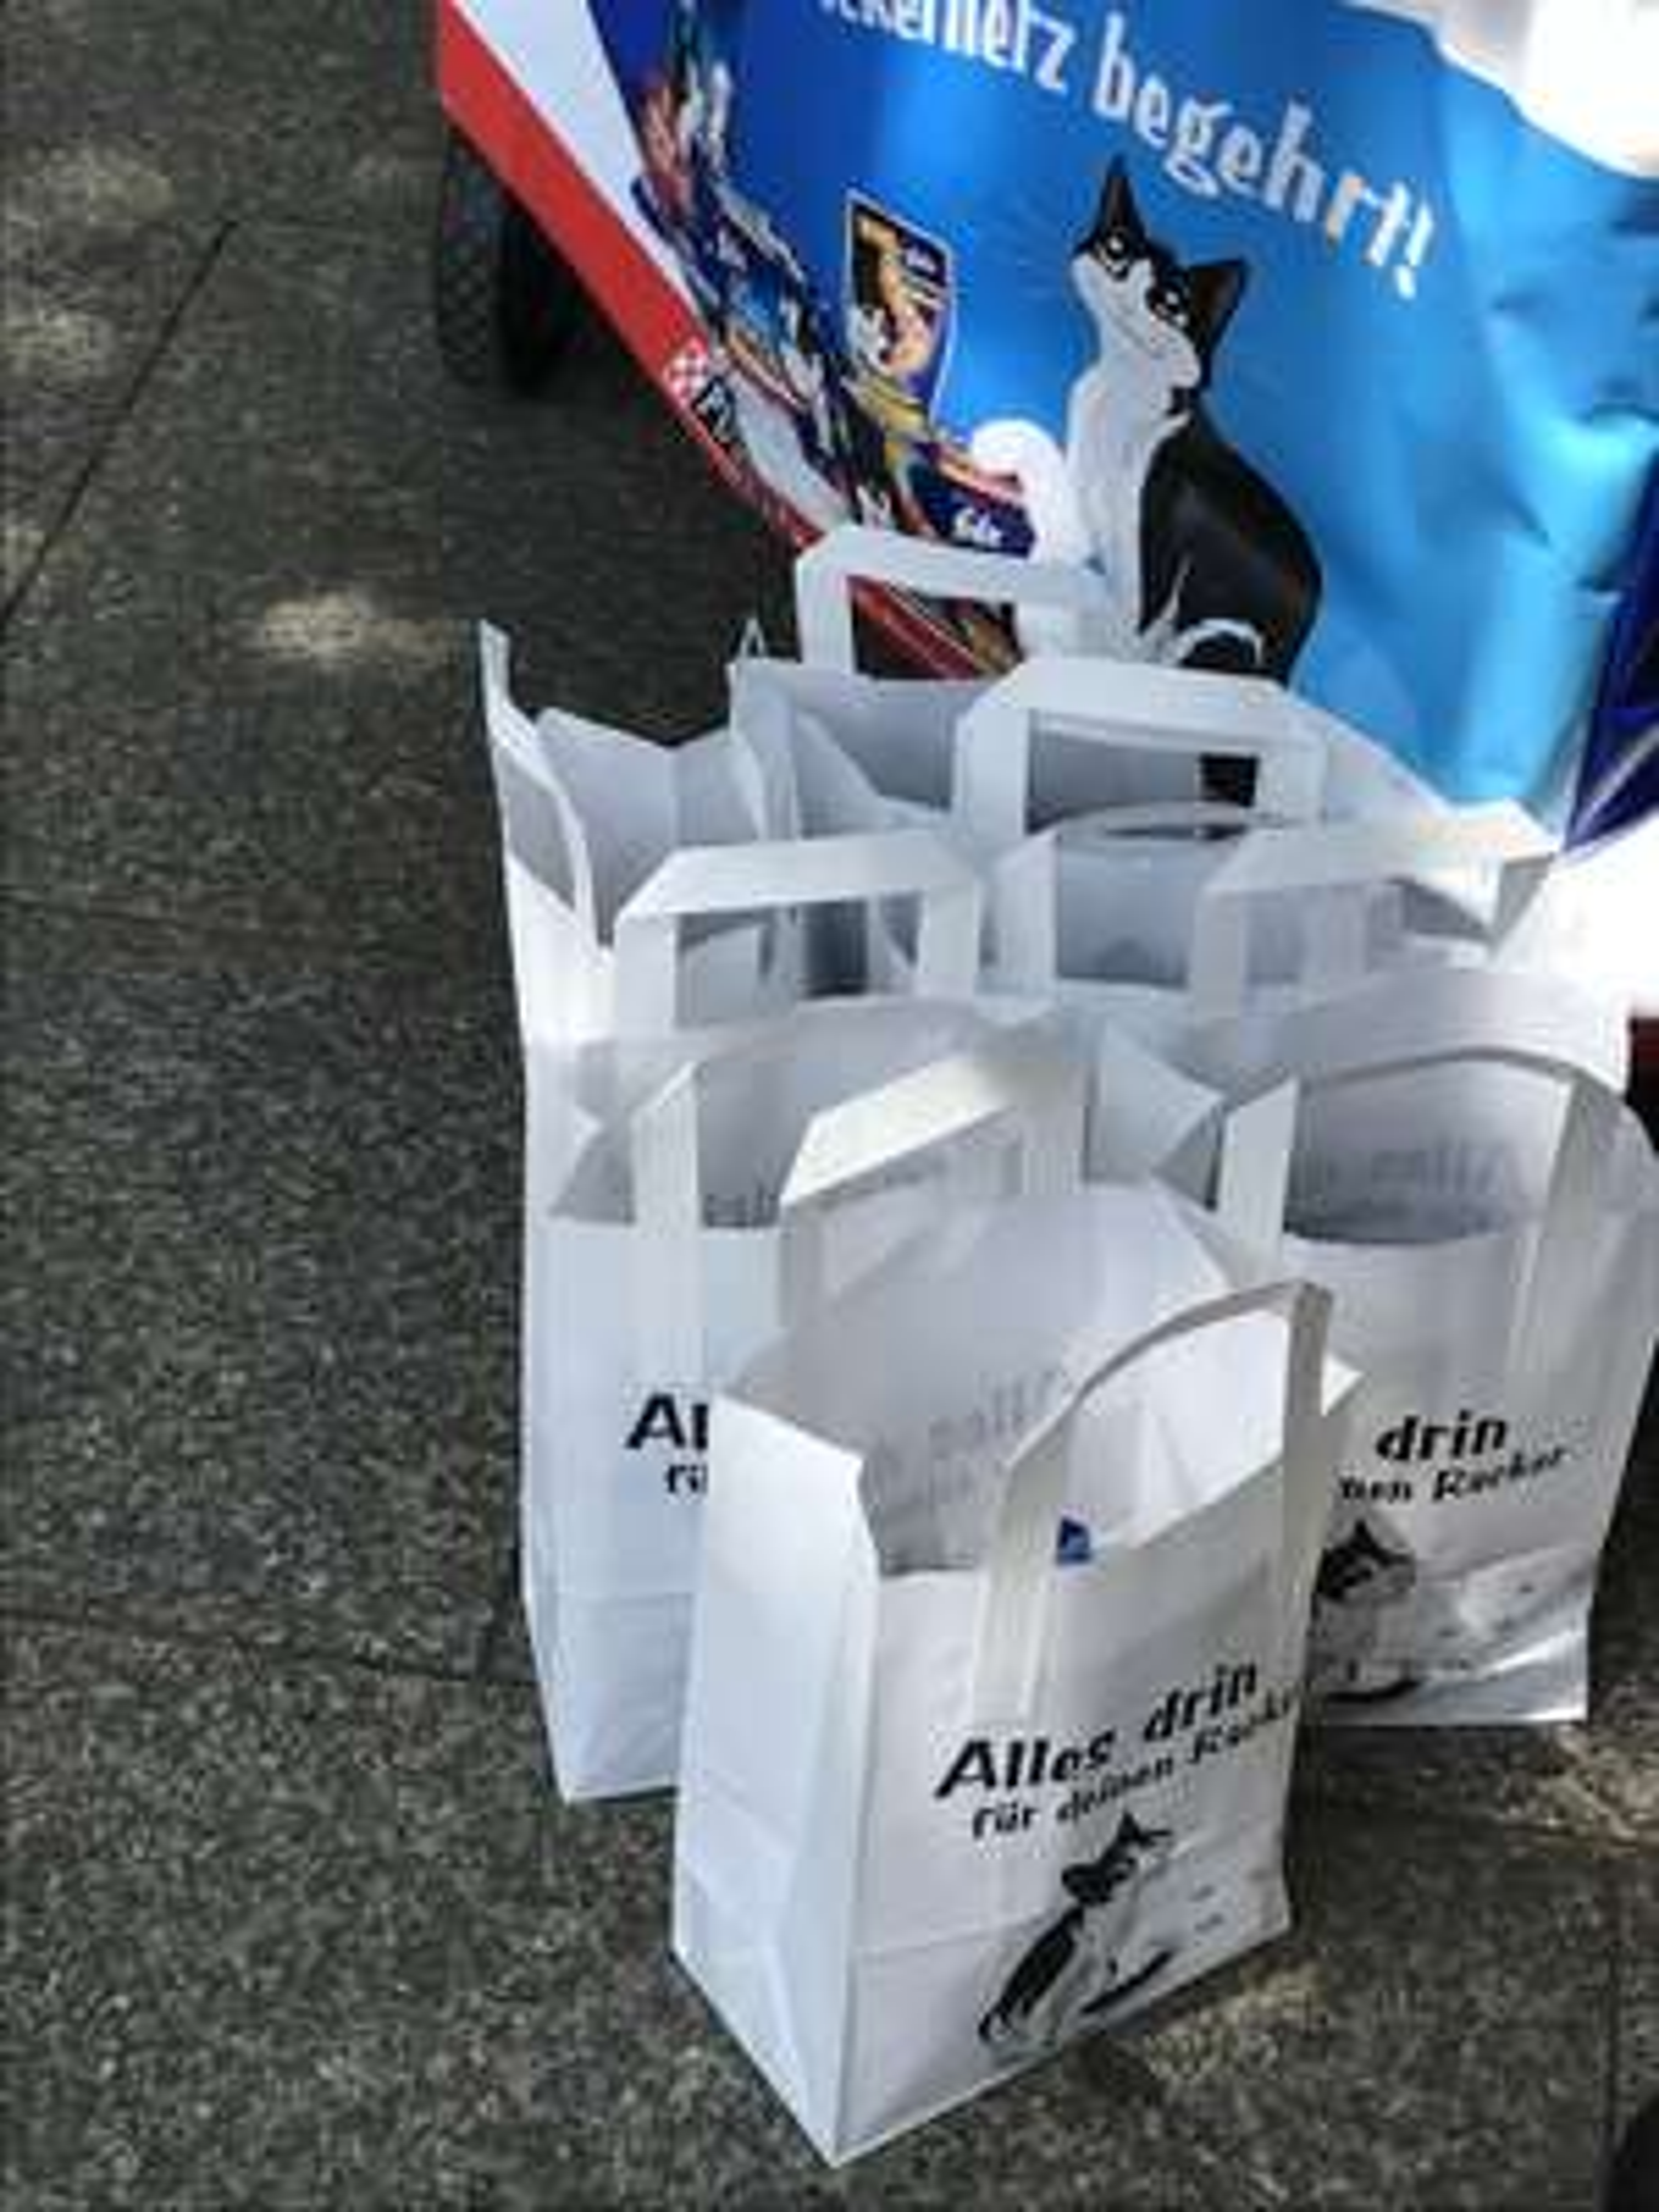 [Lokal](Köln HBF) kostenloses Katzenfutter